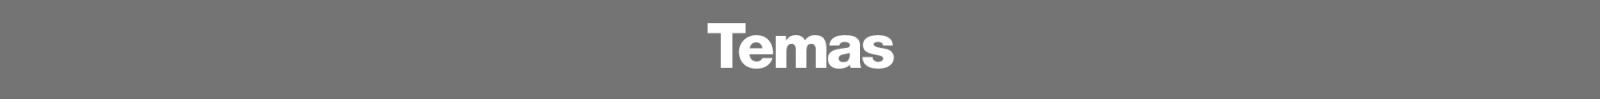 Temas Fórum Melanoma